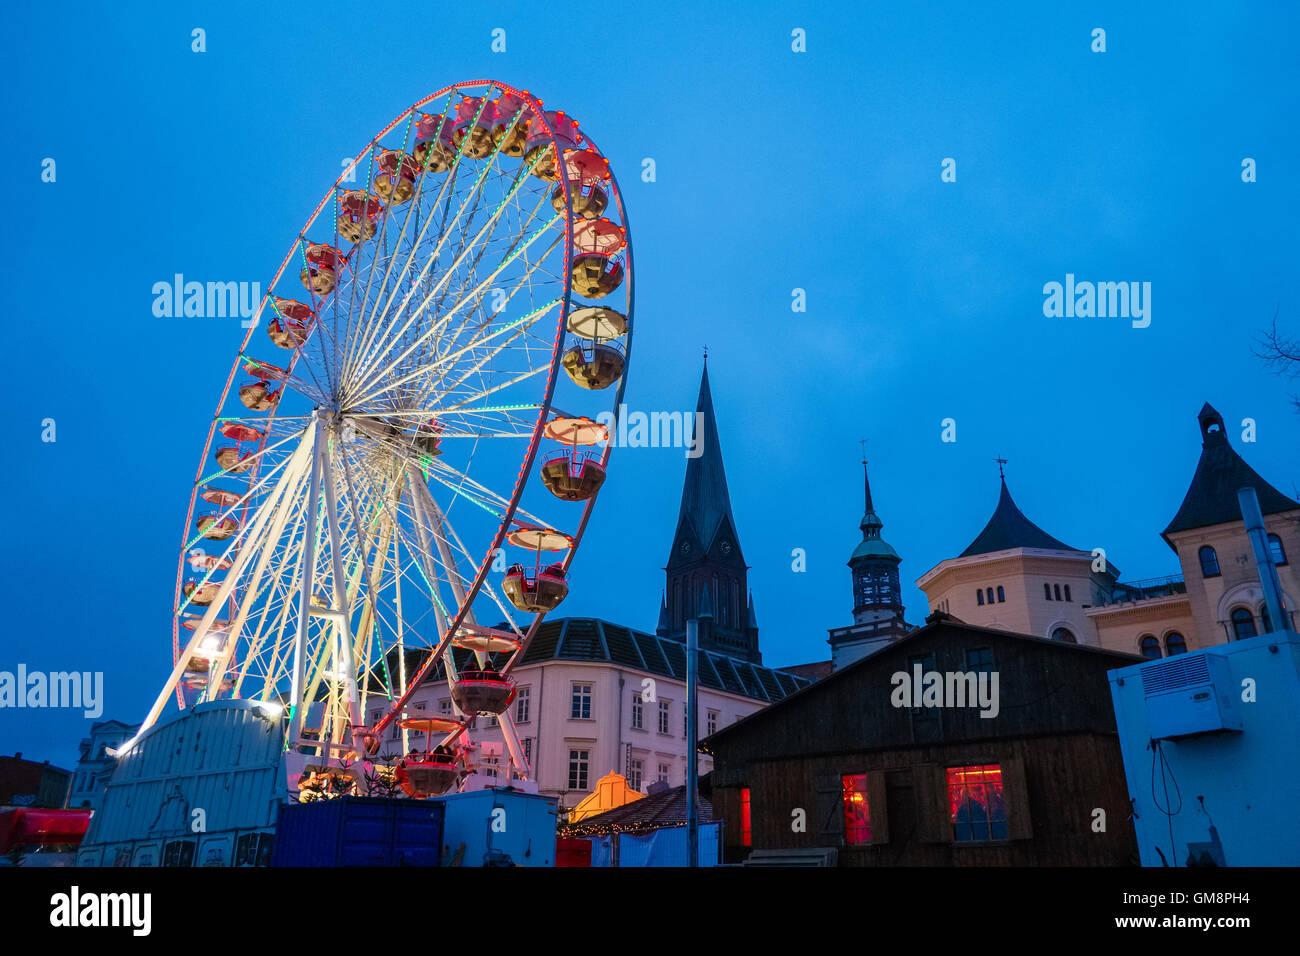 Giant Wheel, Schwerin, Mecklenburg Western Pomerania, Germany - Stock Image